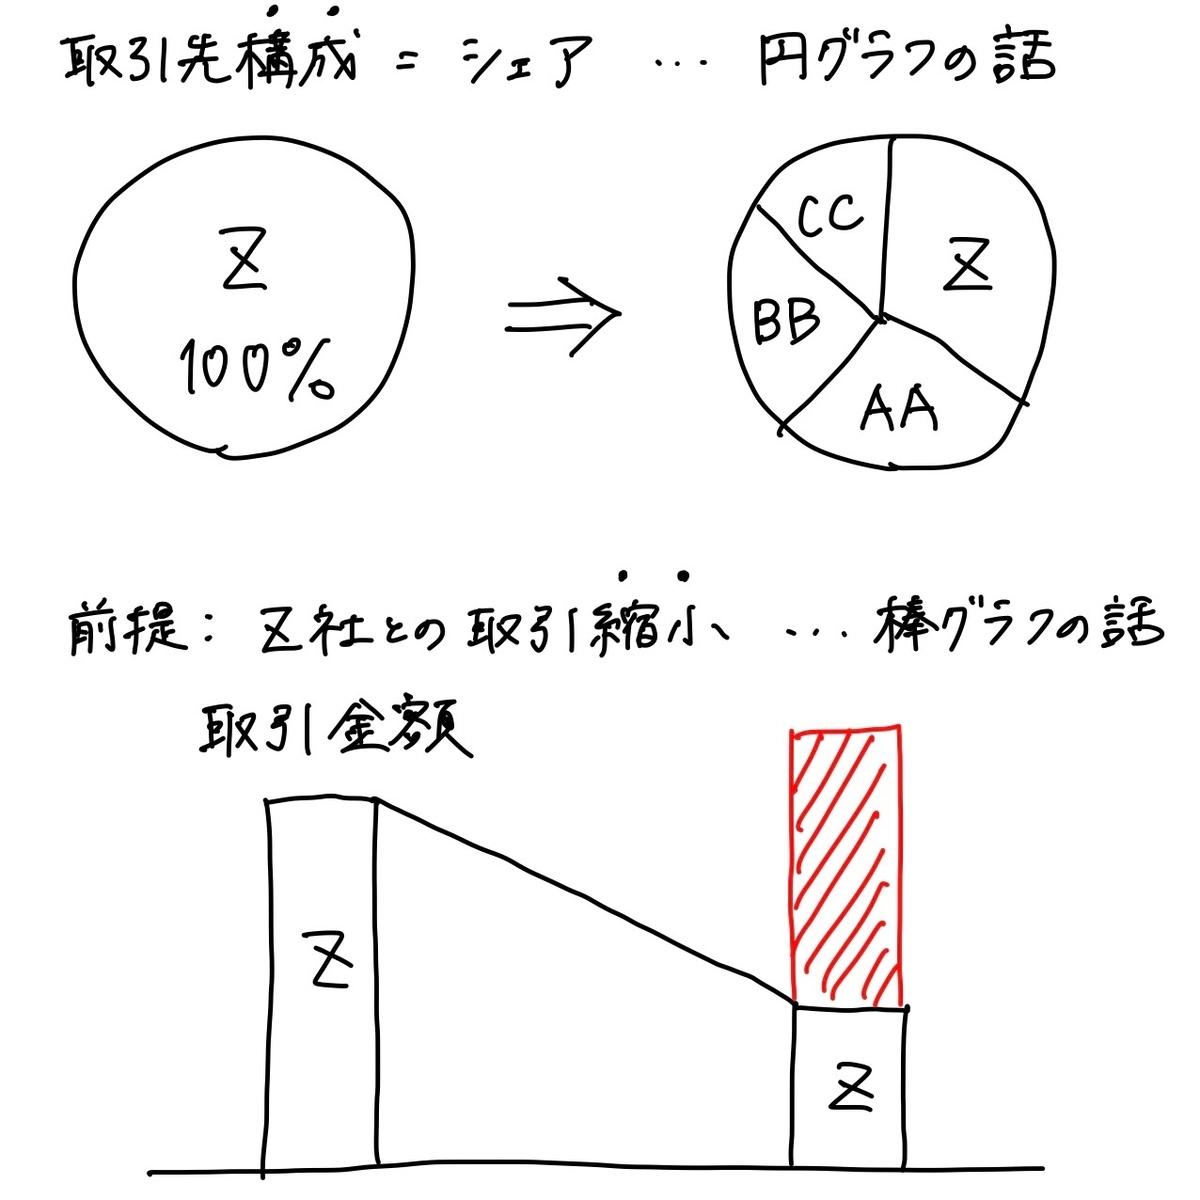 f:id:emily_study:20210628000350j:plain